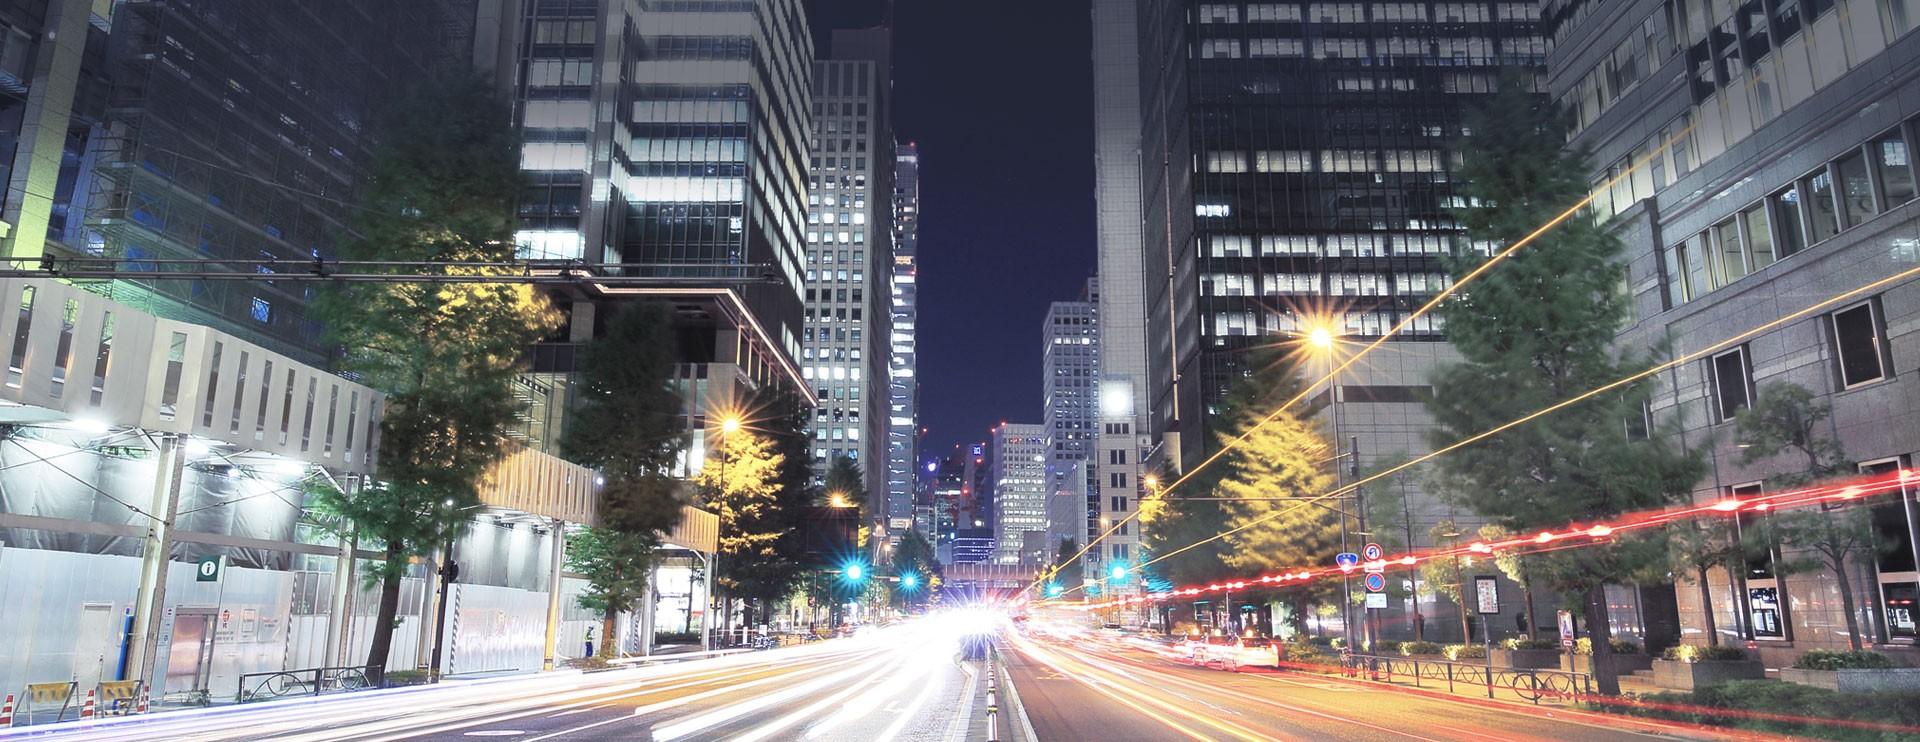 Strada tra grattacieli